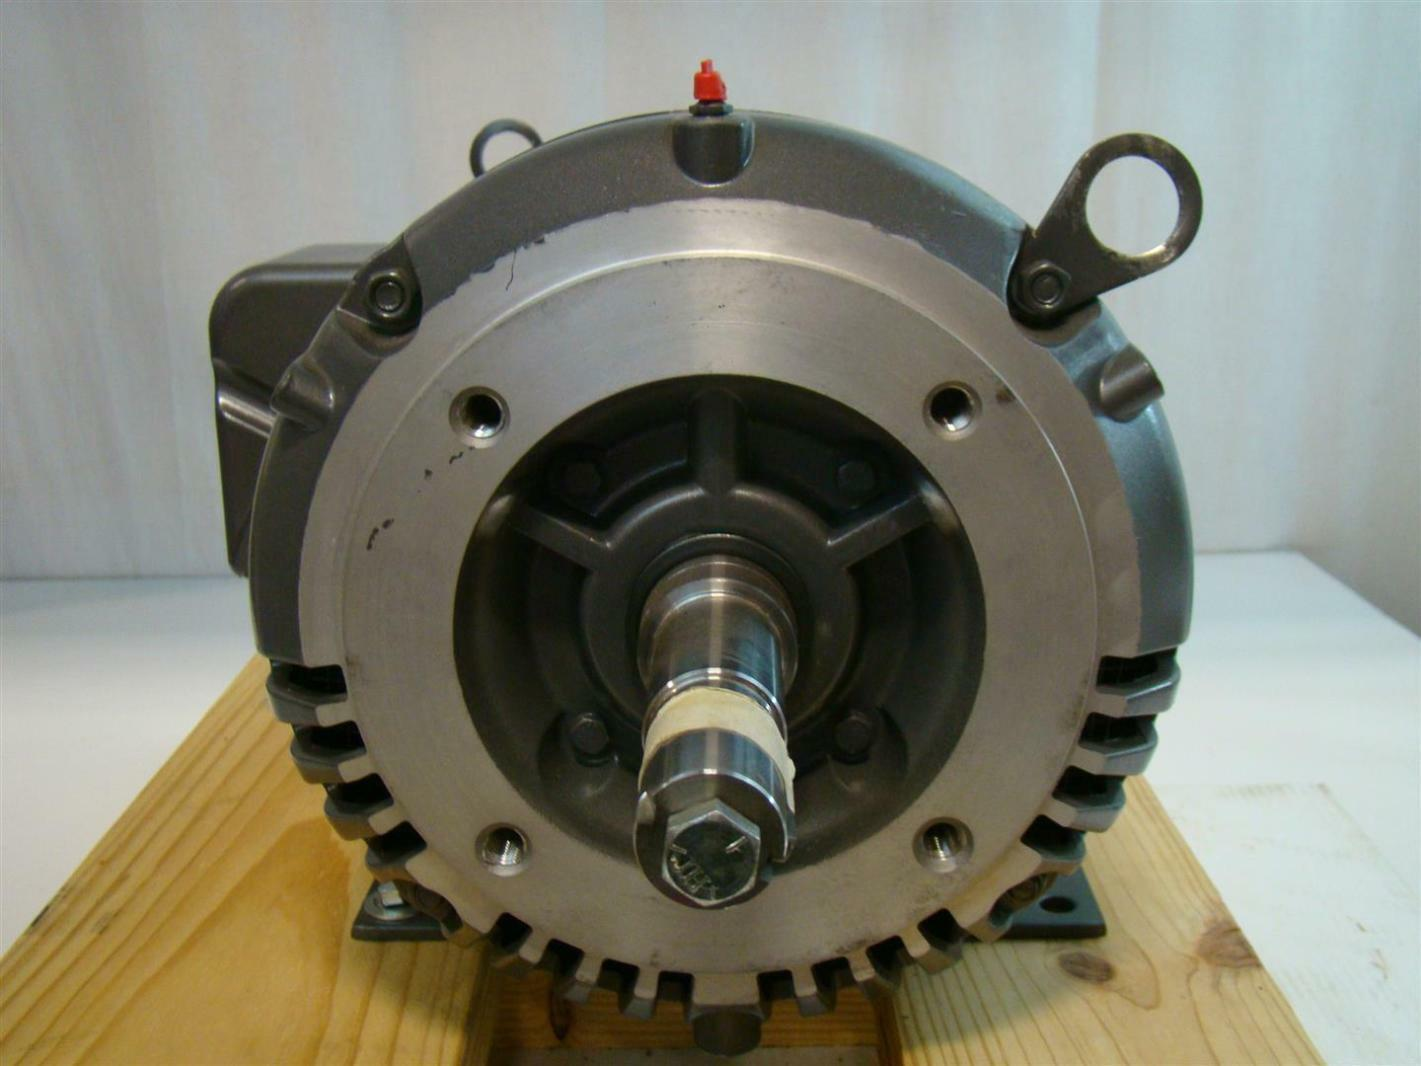 Baldor reliancer industrial motor 20hp 220 380v 50 29a Baldor industrial motor pump